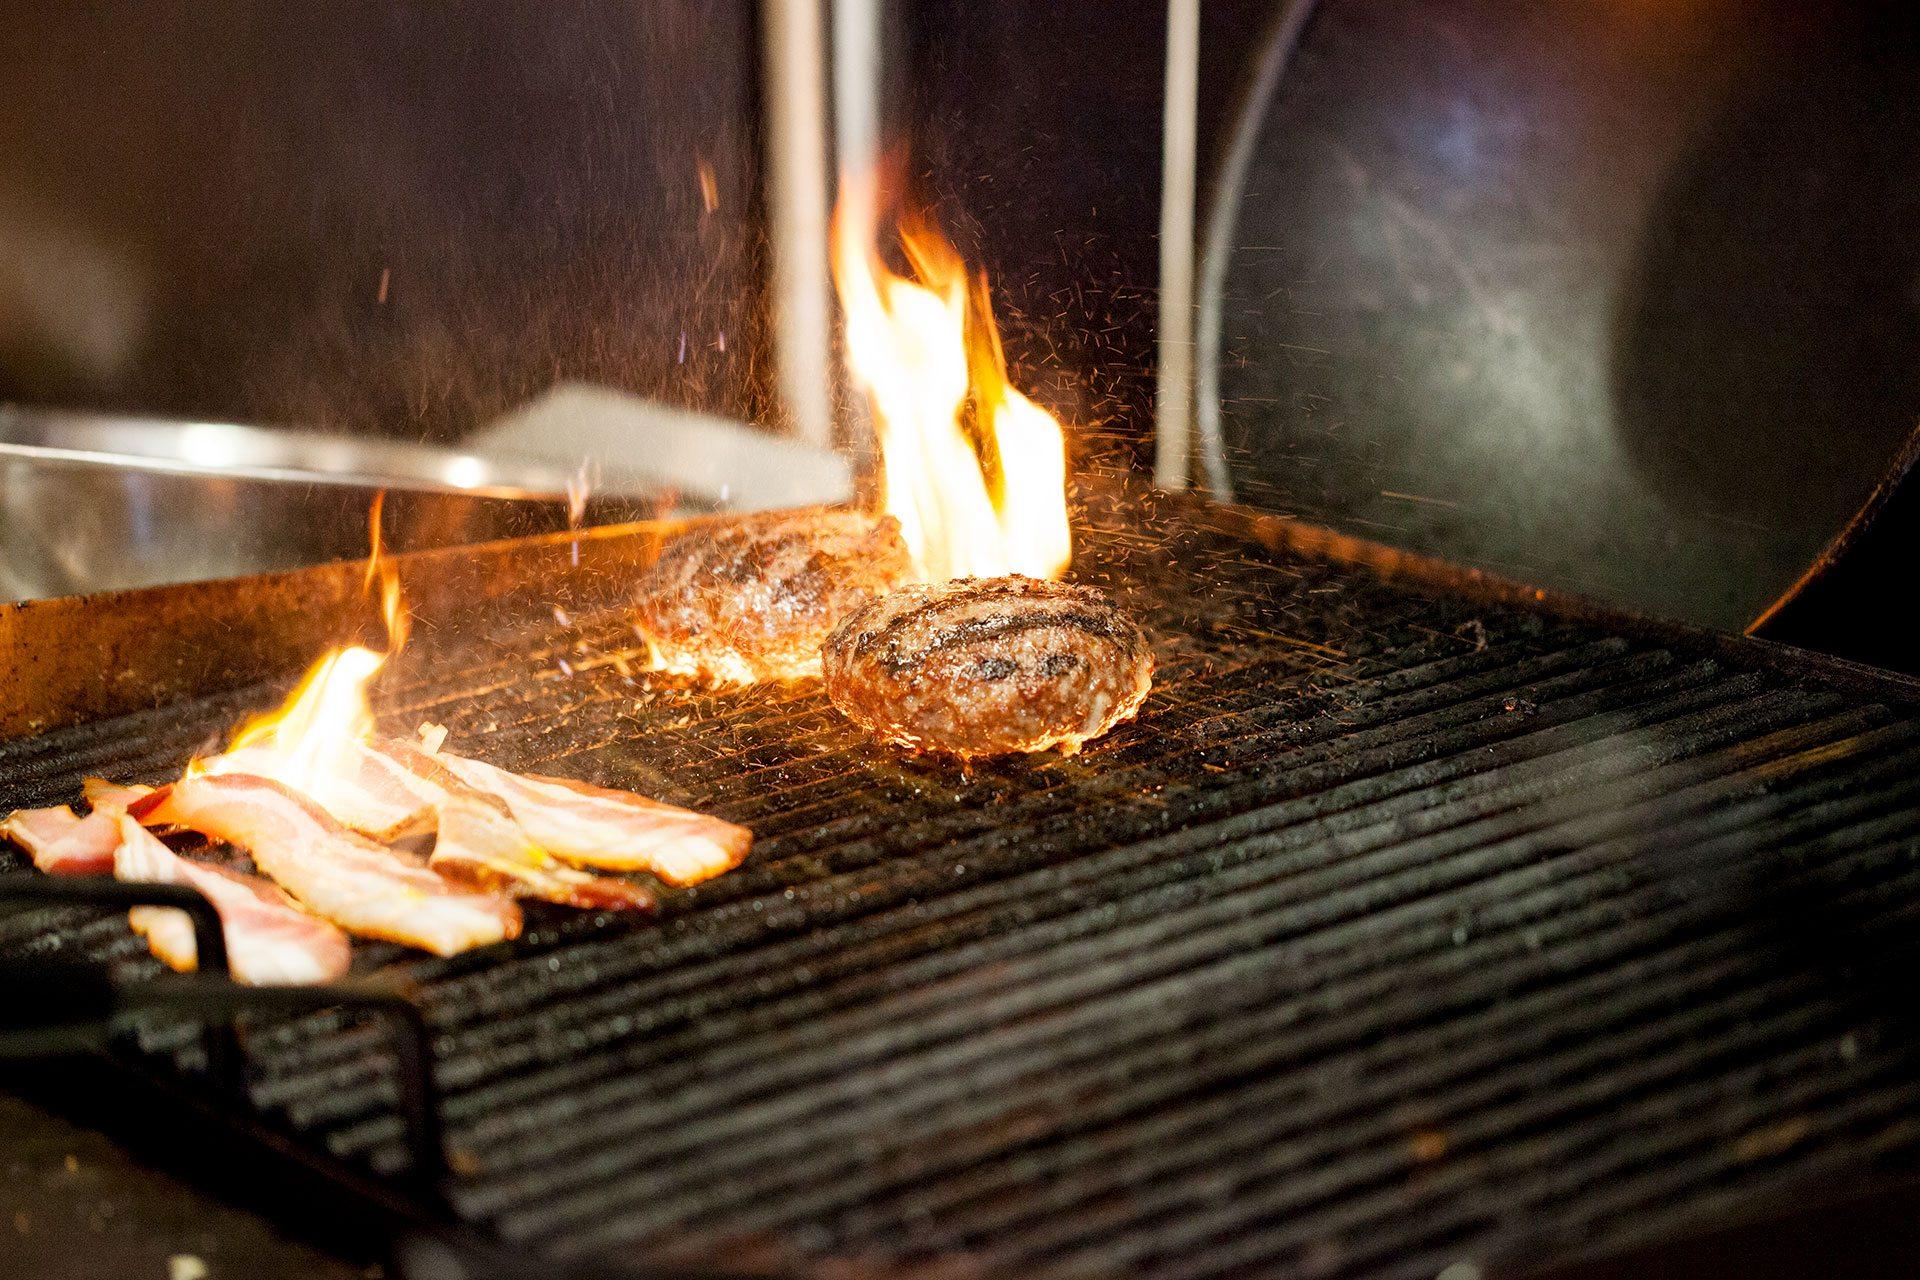 Oomph_Creative_Agency_Smoke_Shack_Food_Photography_Milton_Keynes_Stony_Stratford